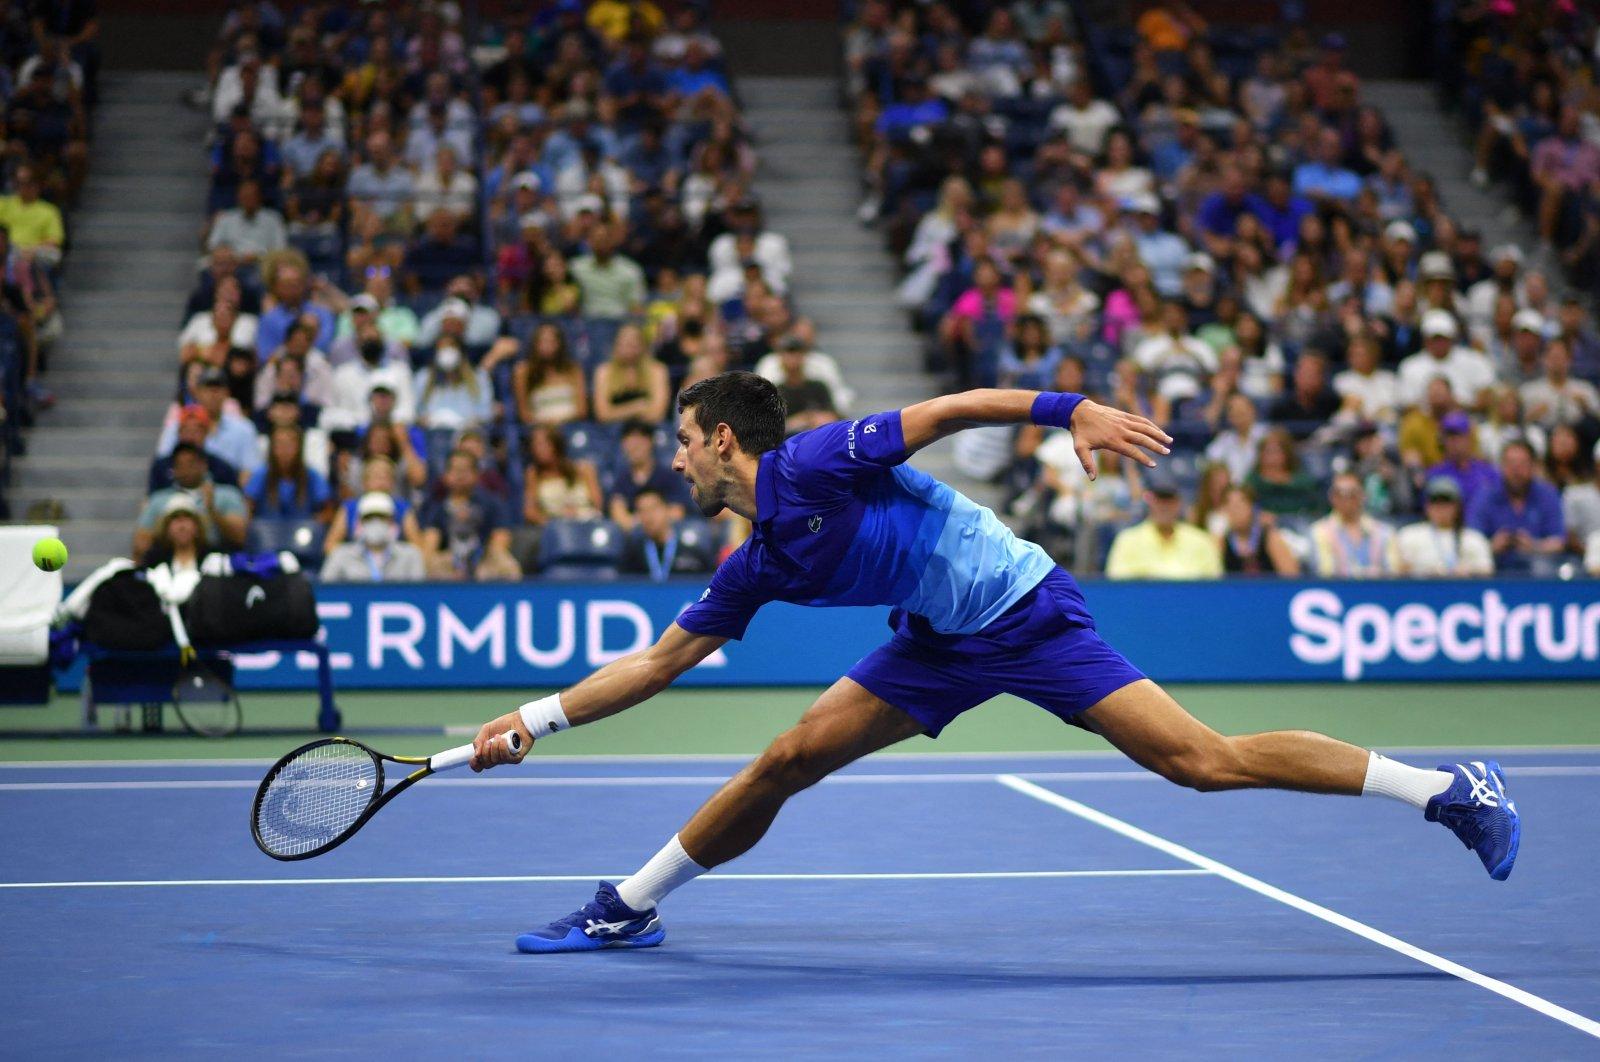 Serbia's Novak Djokovic hits a return to U.S.' Jenson Brooksby during their 2021 U.S. Open men's singles fourth-round match, New York, U.S., Sept. 6, 2021. (AFP Photo)